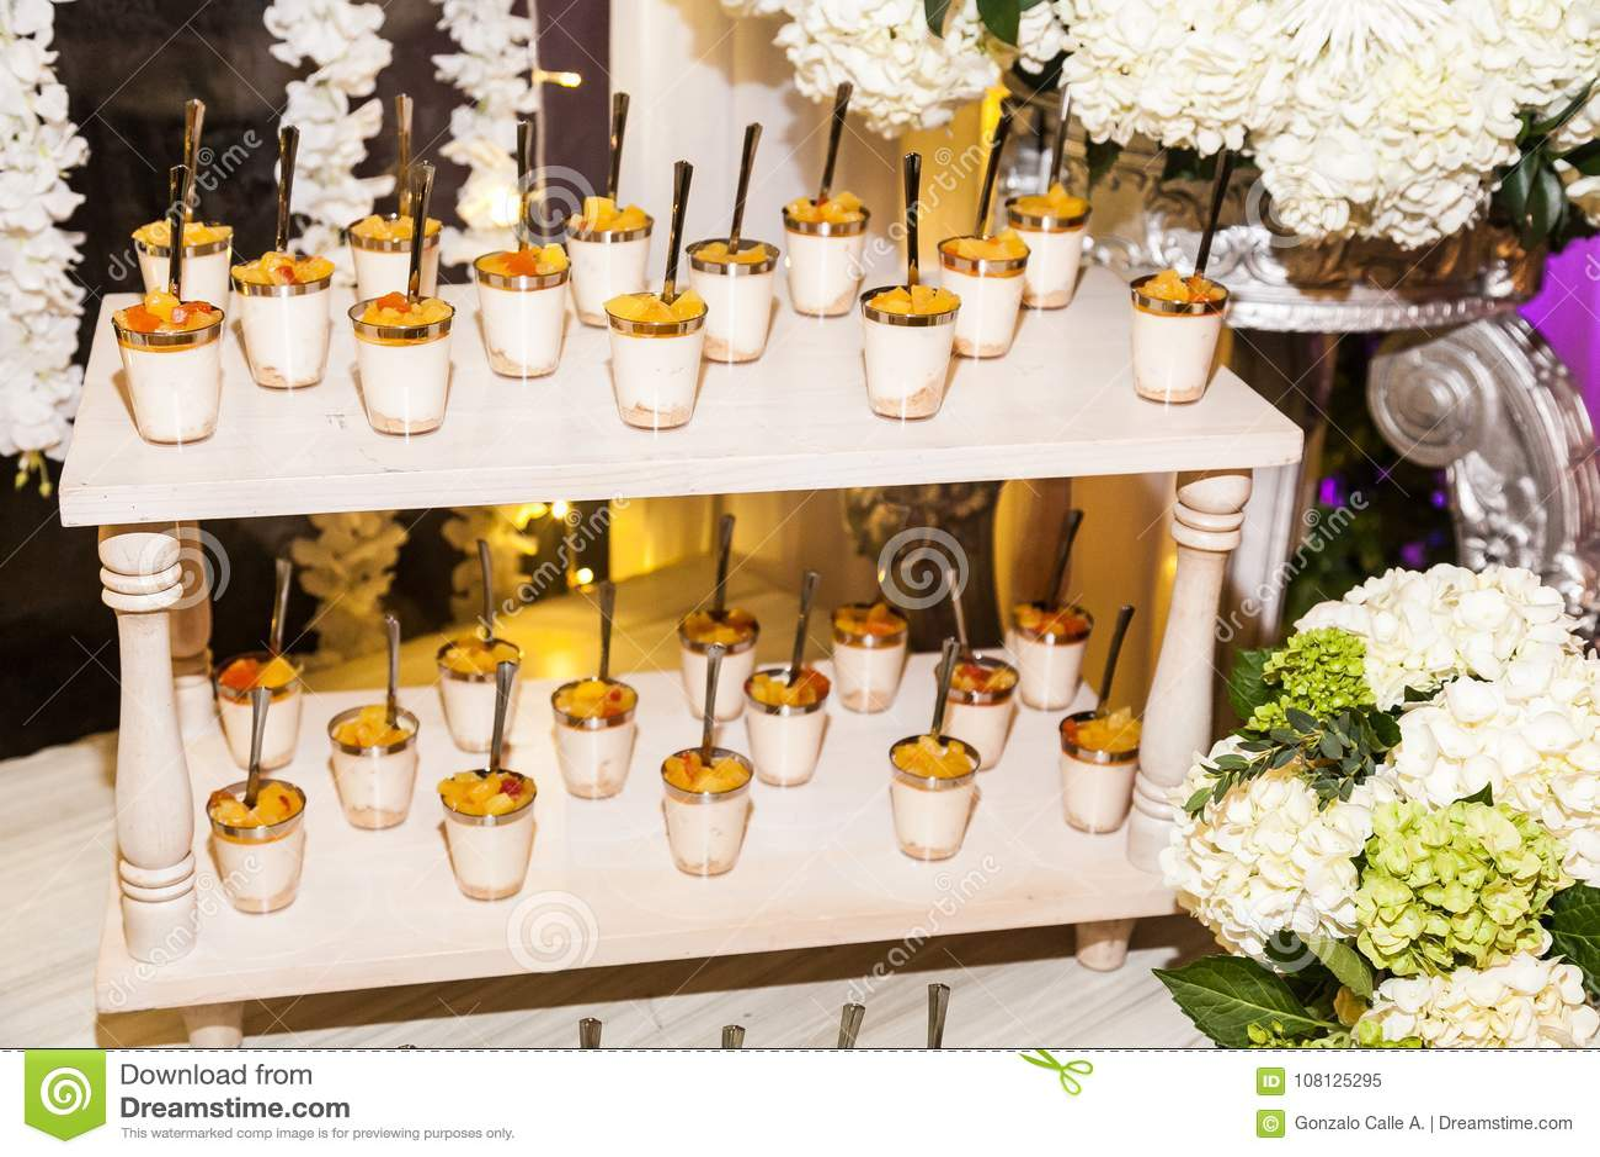 Delicious Wedding Reception Candy Bar Dessert Table Stock Image